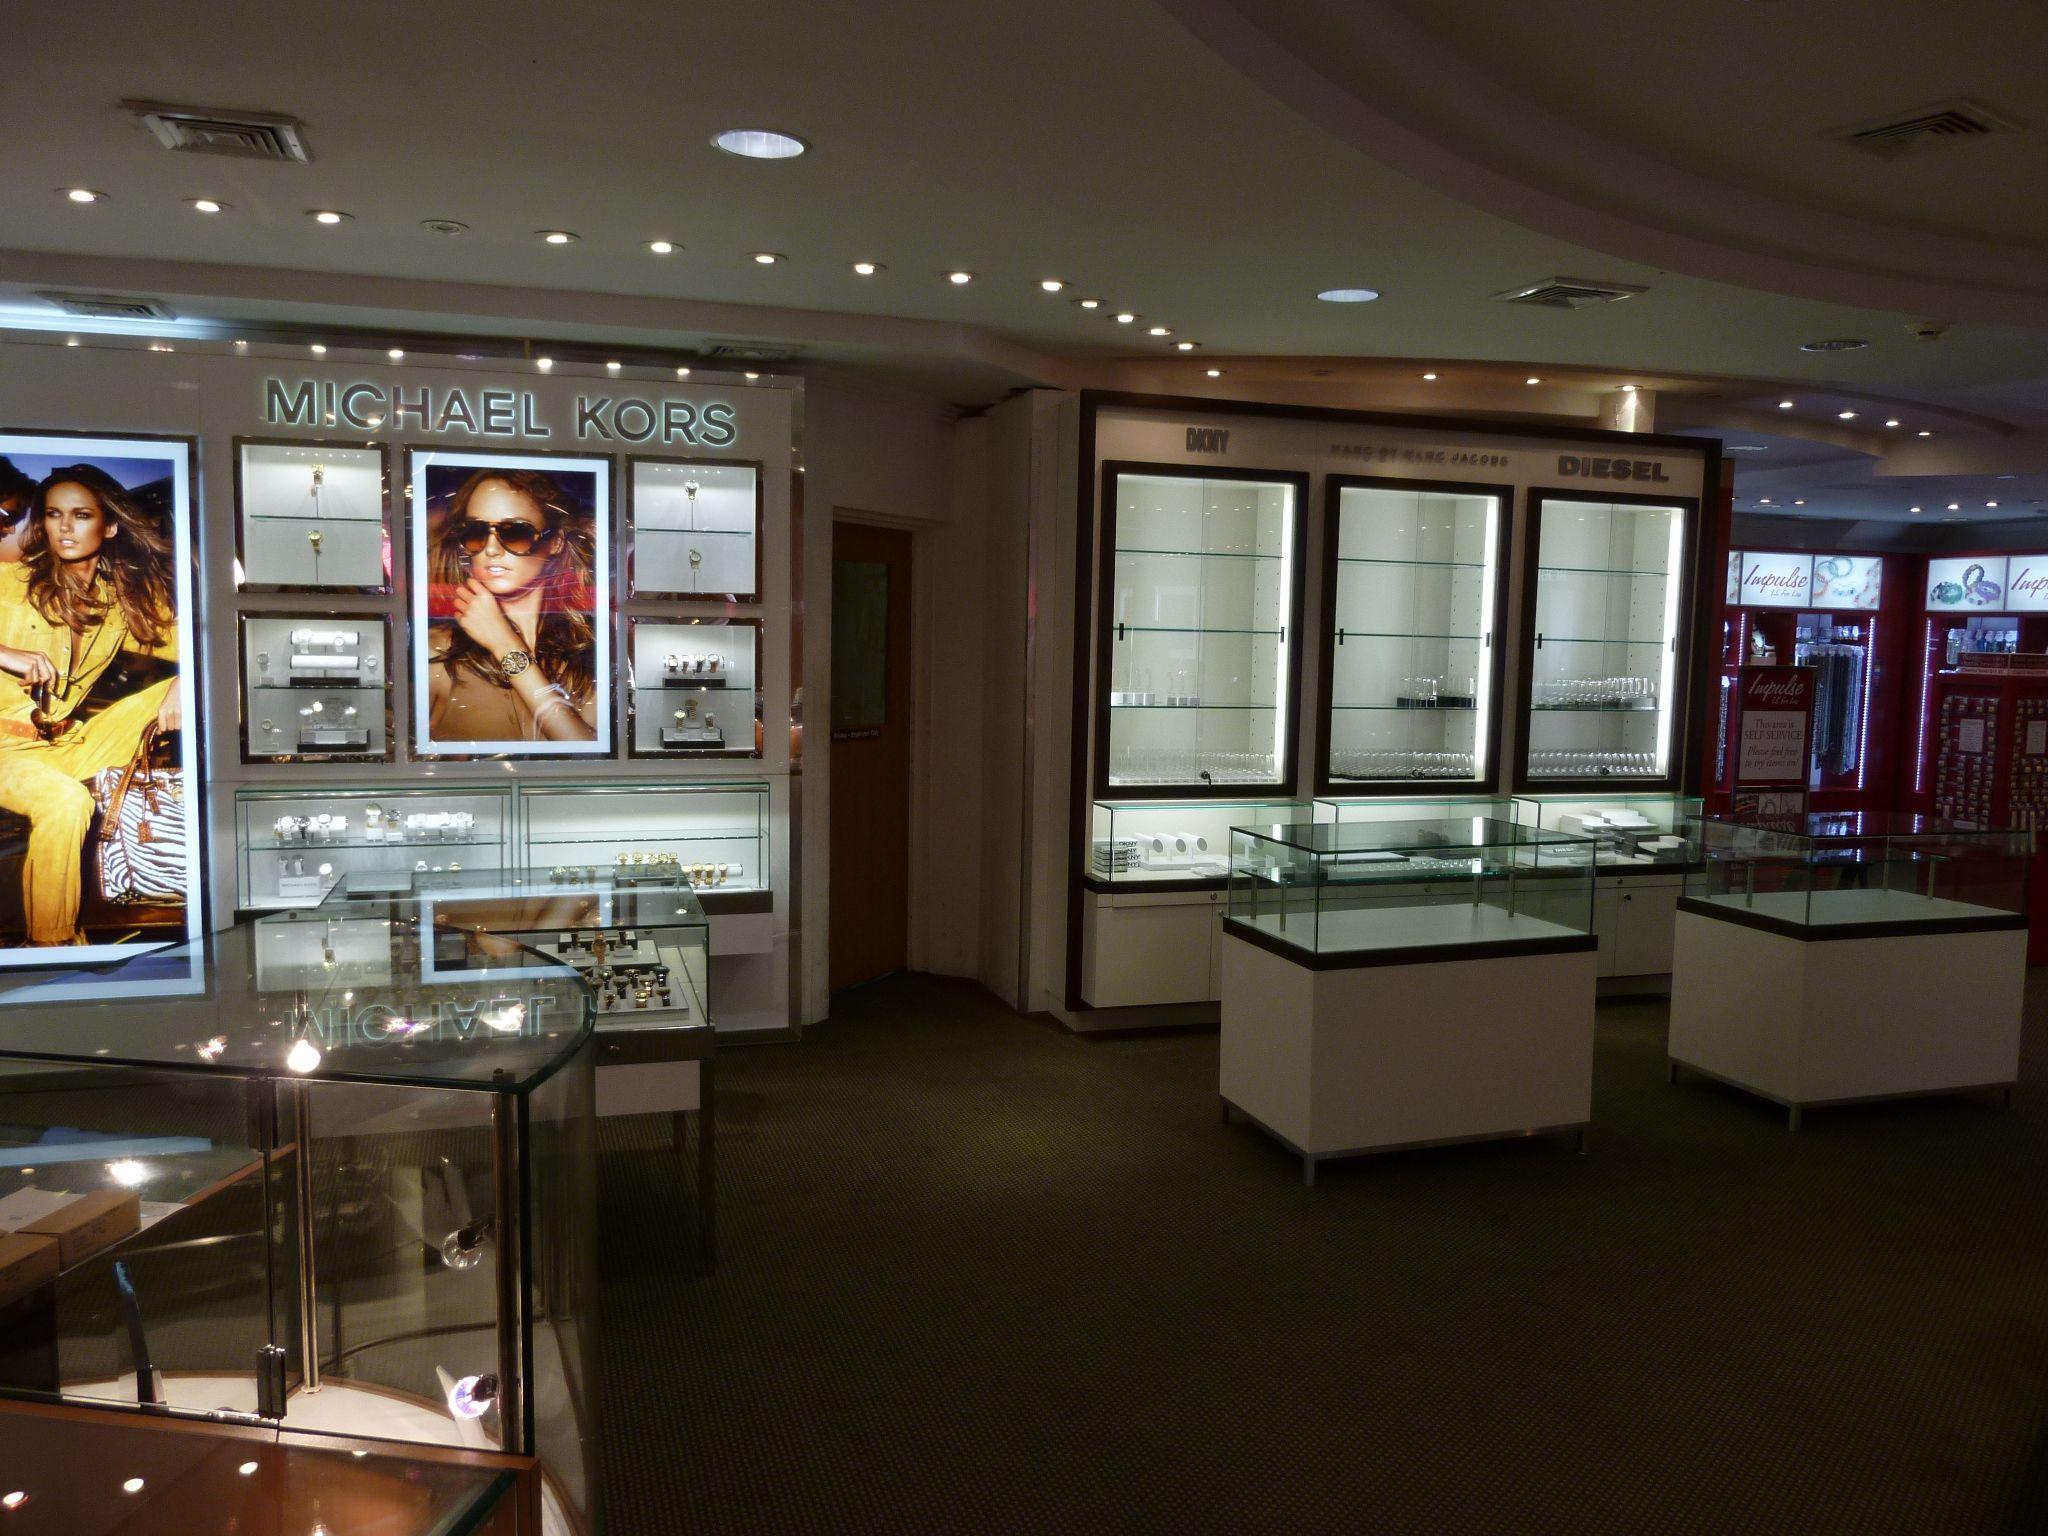 39+ Impulse jewelry mall of america ideas in 2021